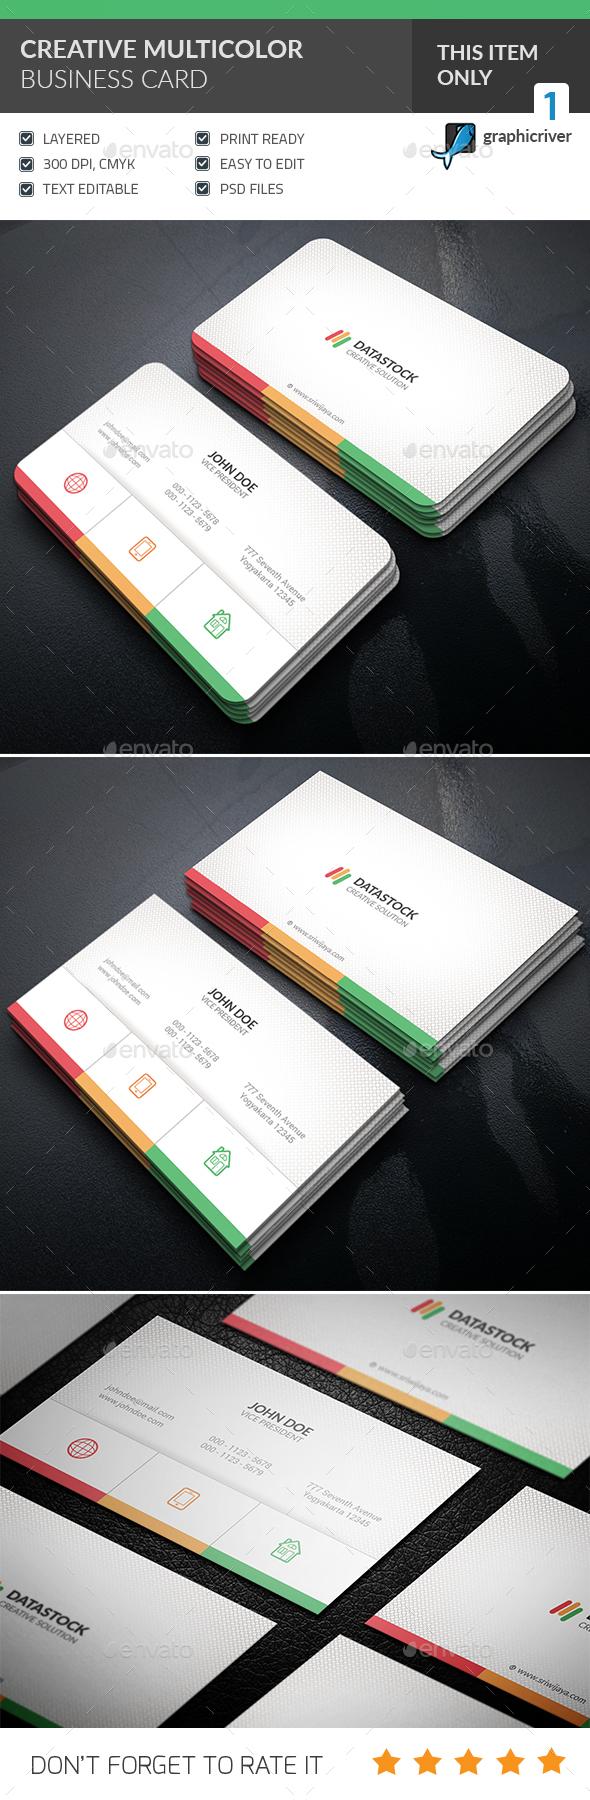 Multicolor Business Card - Corporate Business Cards